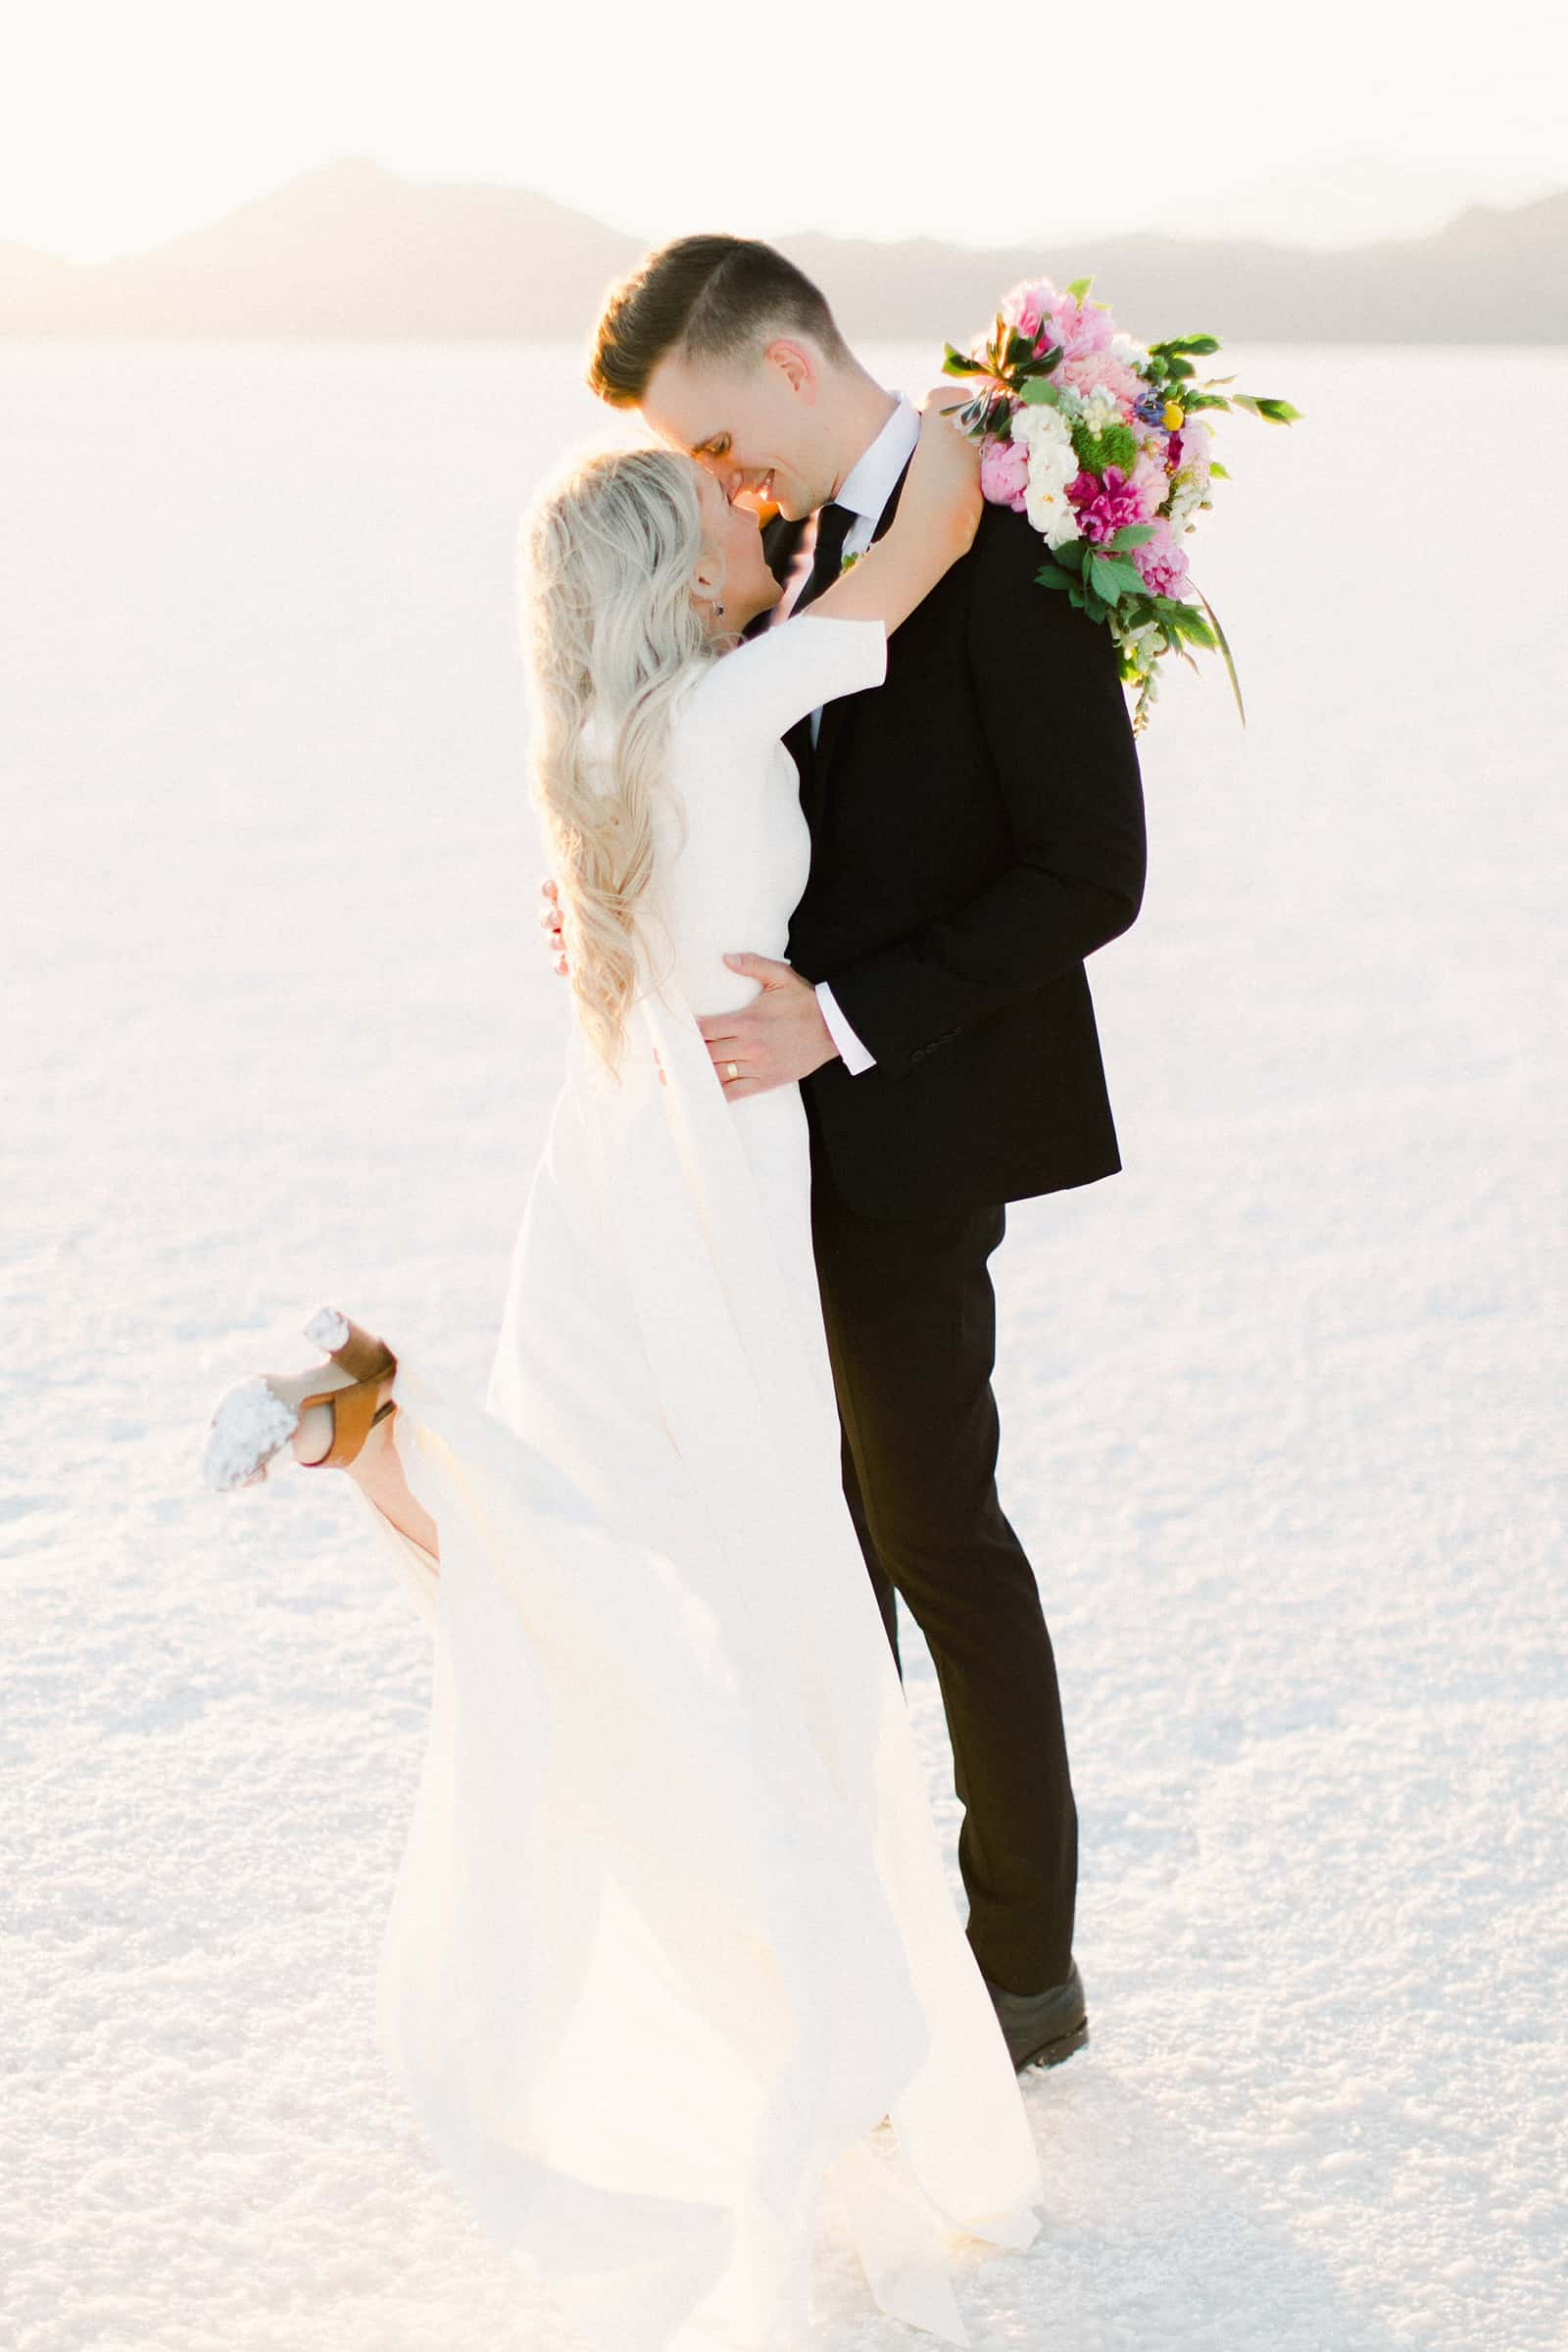 Bonneville Salt Flats Utah Wedding Photography, destination wedding, bride snd groom kiss